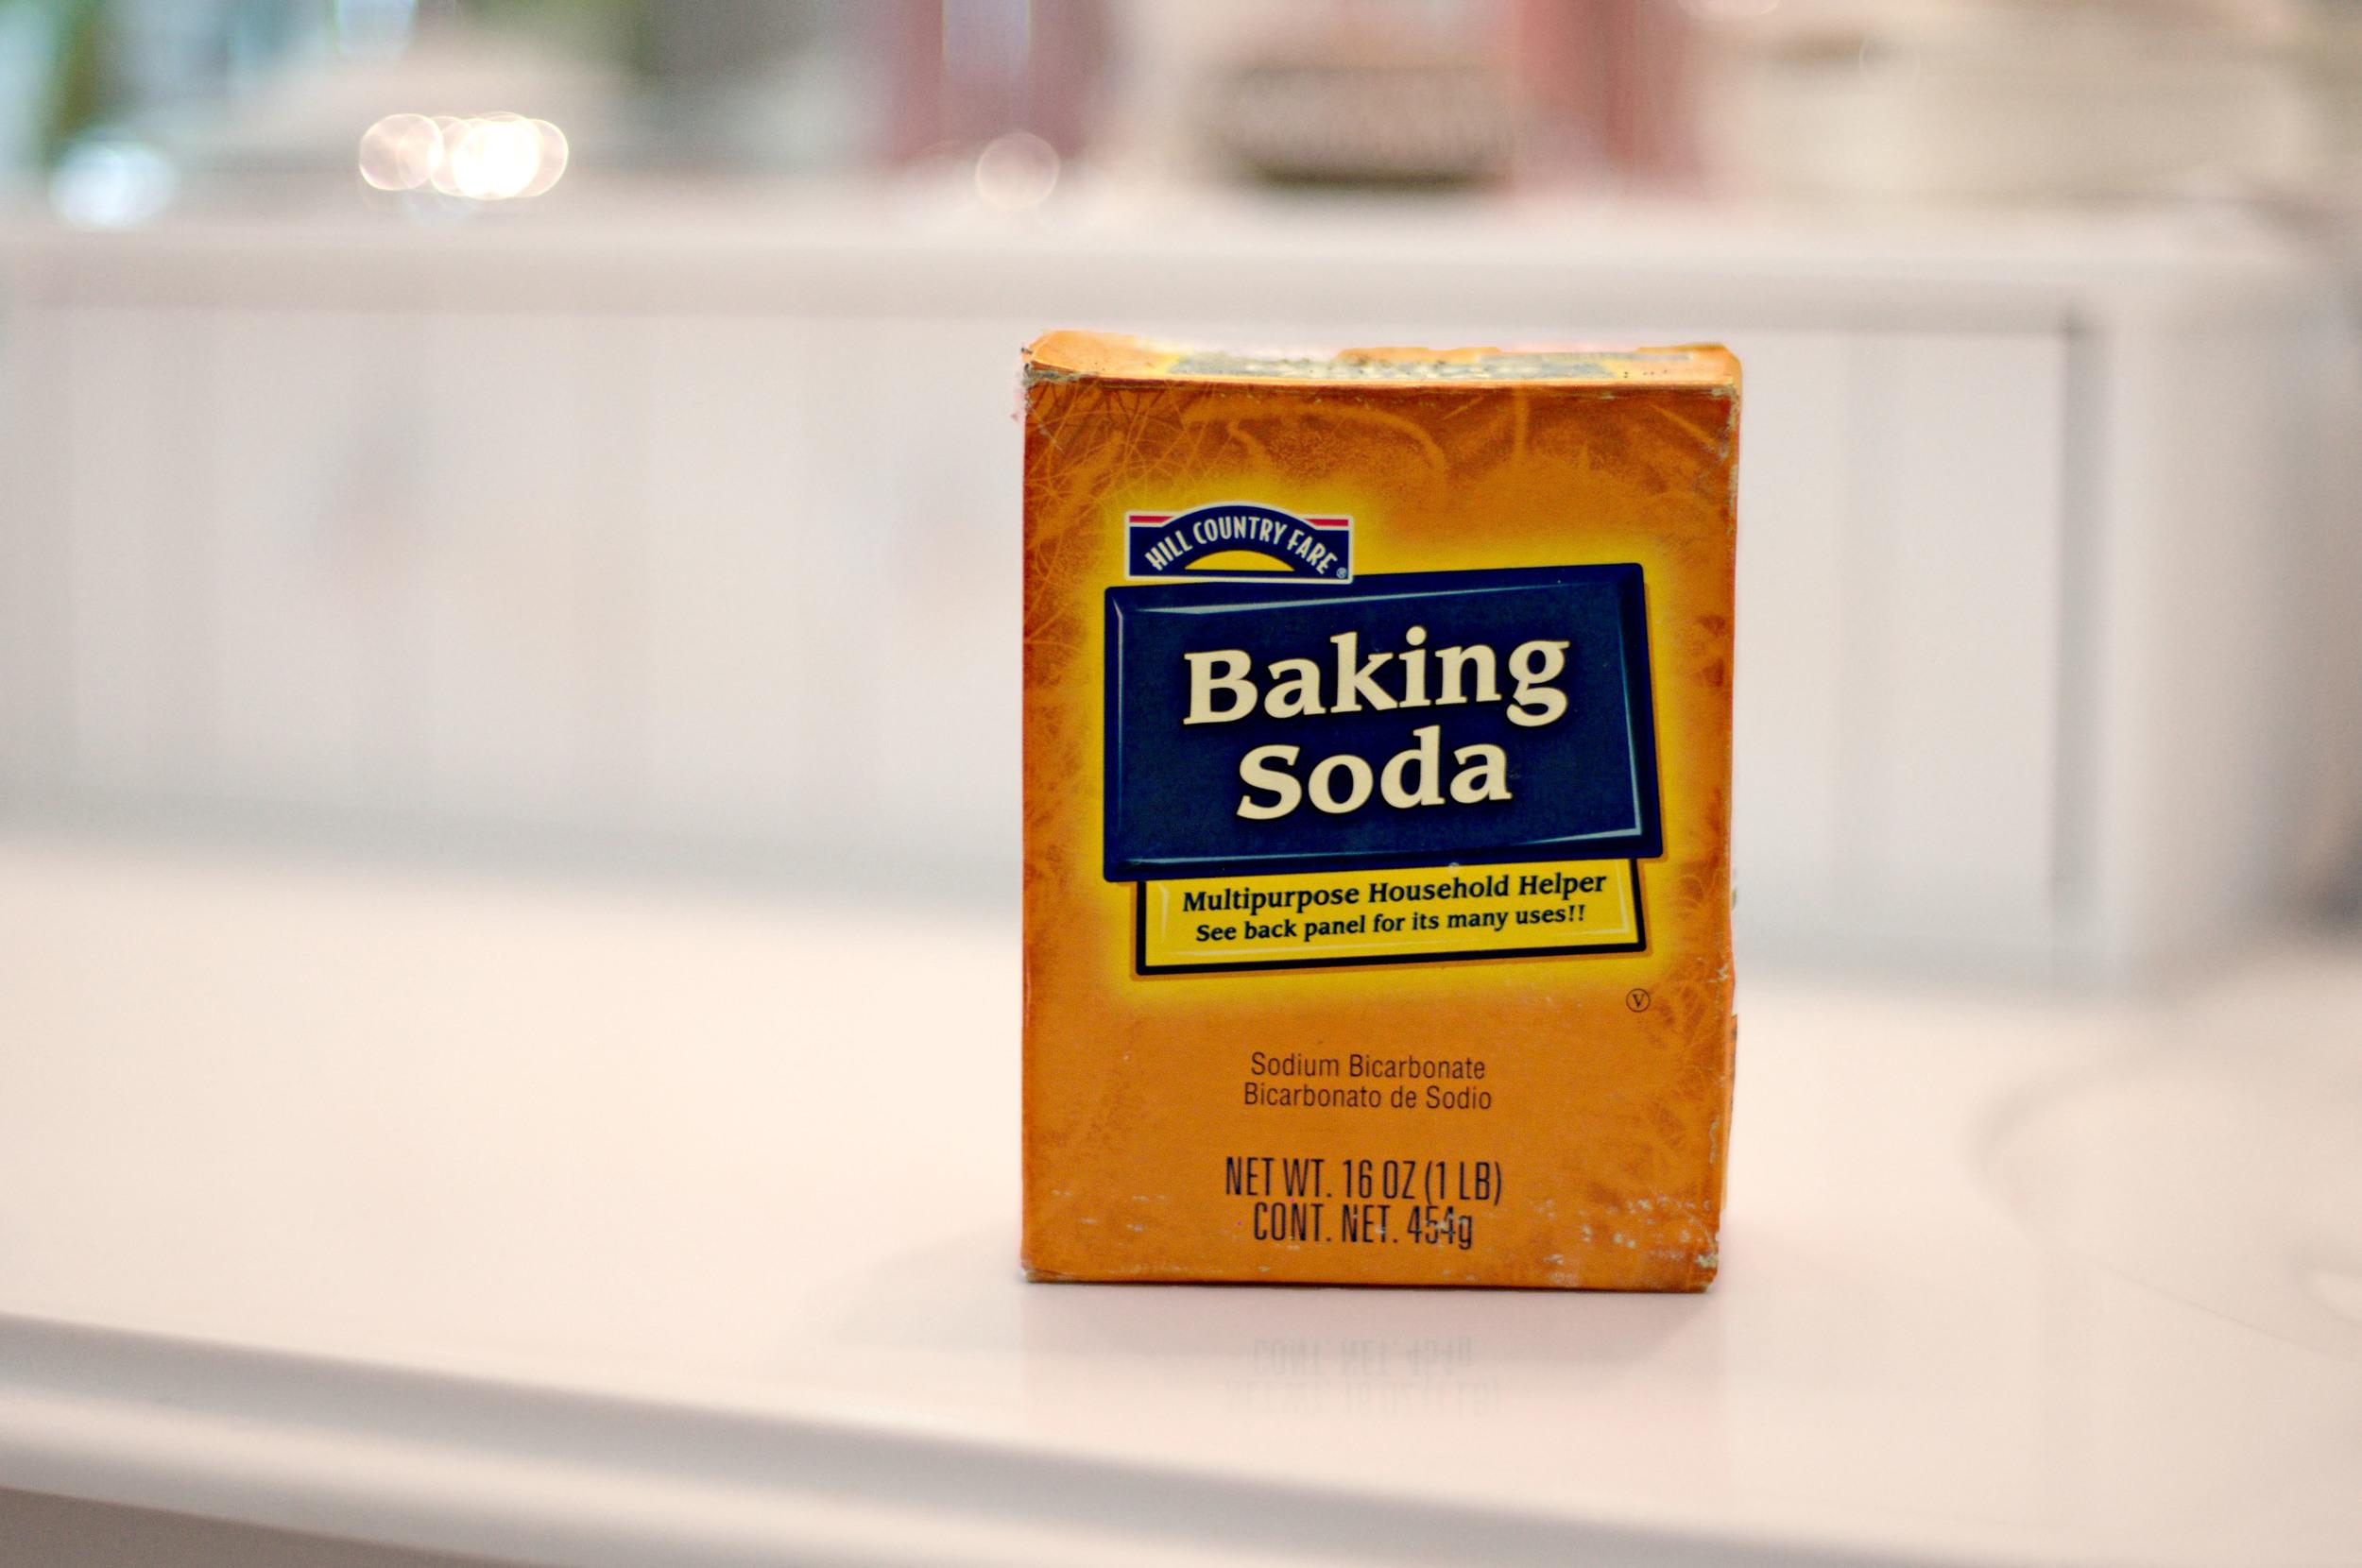 BakingSoda1.jpg